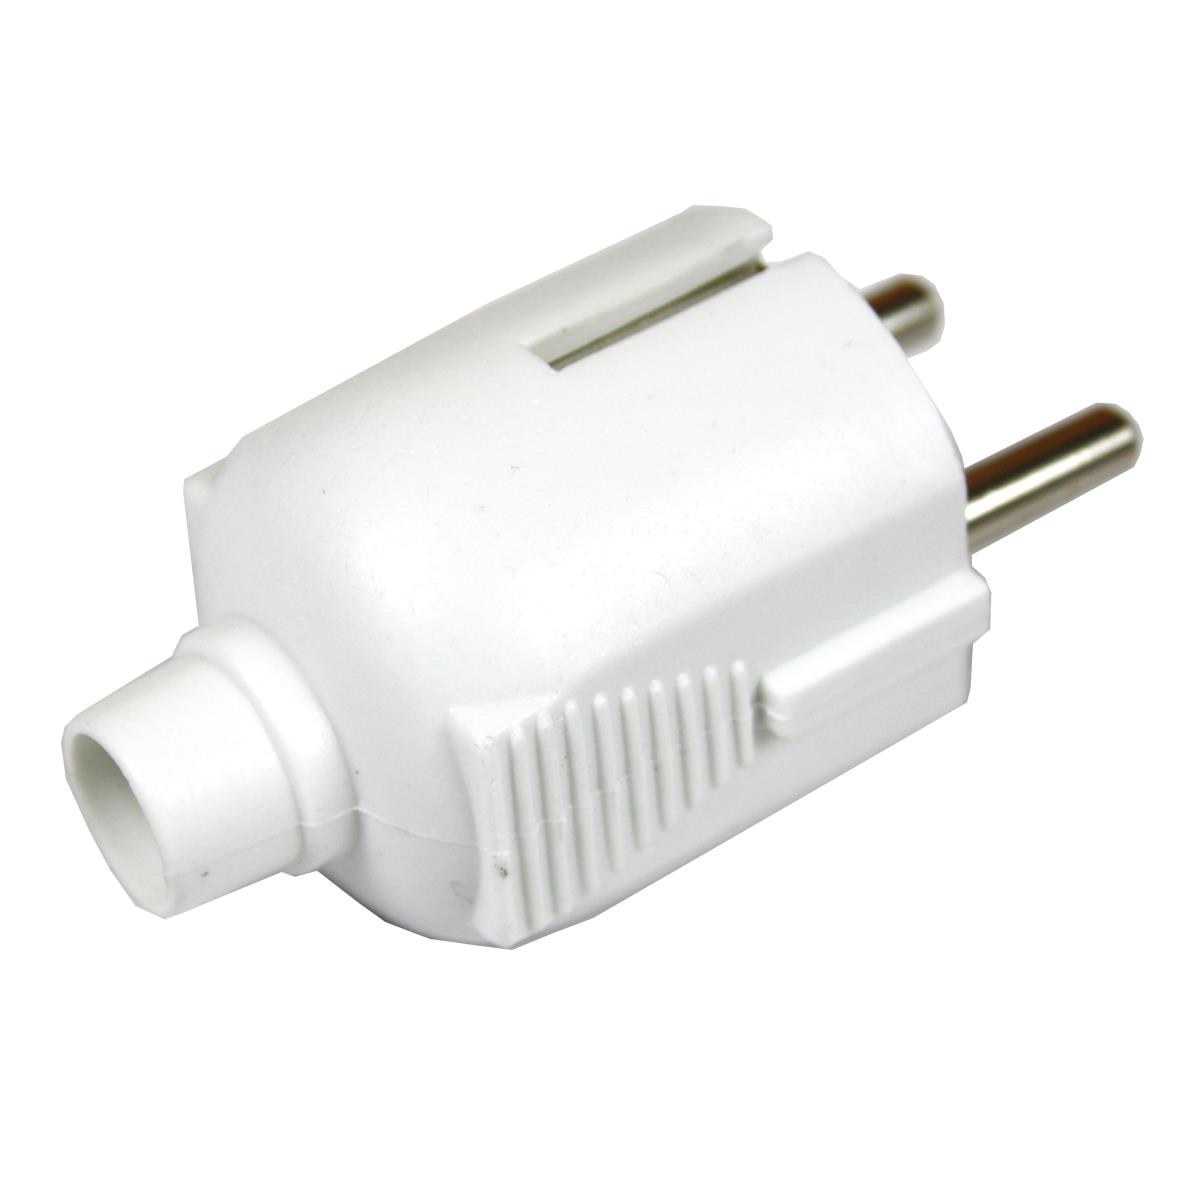 3x Schuko Stecker Strom weiß 230V 16A,Vagner SDH,KF-CR3-W, 0791266464858